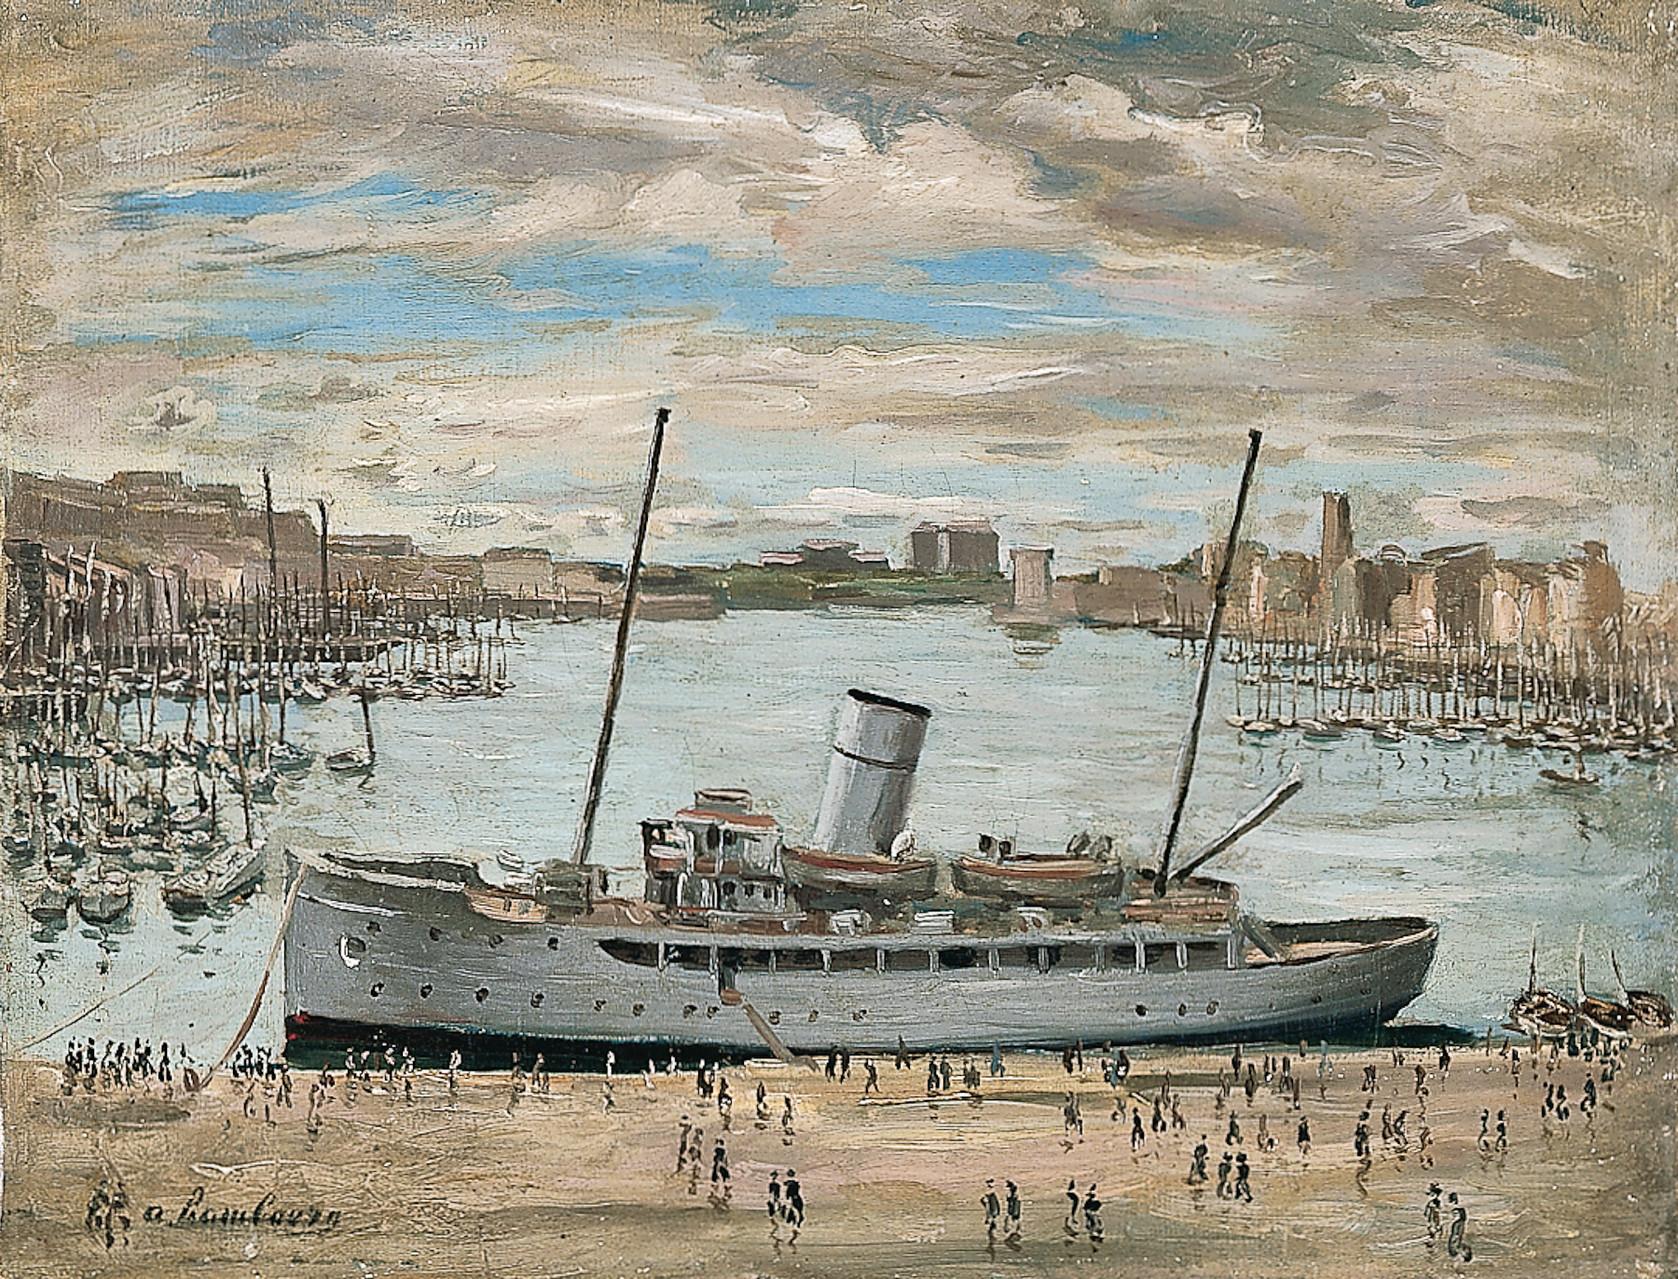 «A Marseille» 1946, 27cmx36cm, GP 22